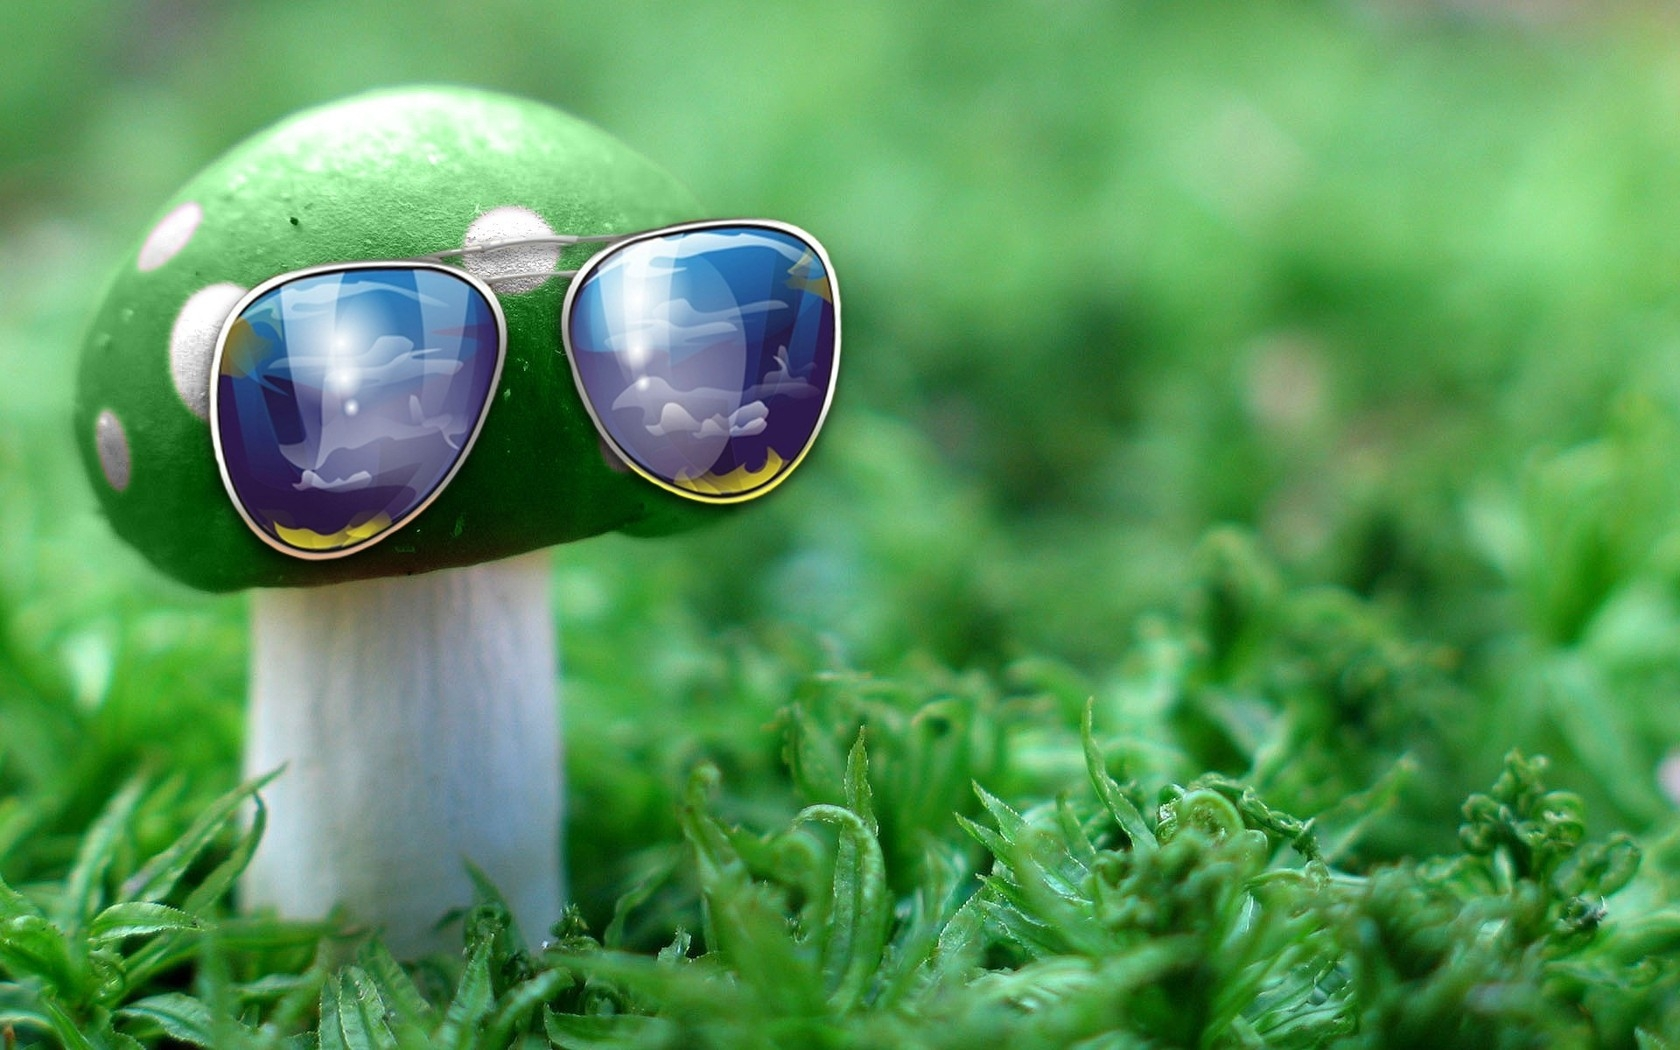 sunglasses-mushroom-IDEA-creative-grass-unusual-1067101-wallhere.com